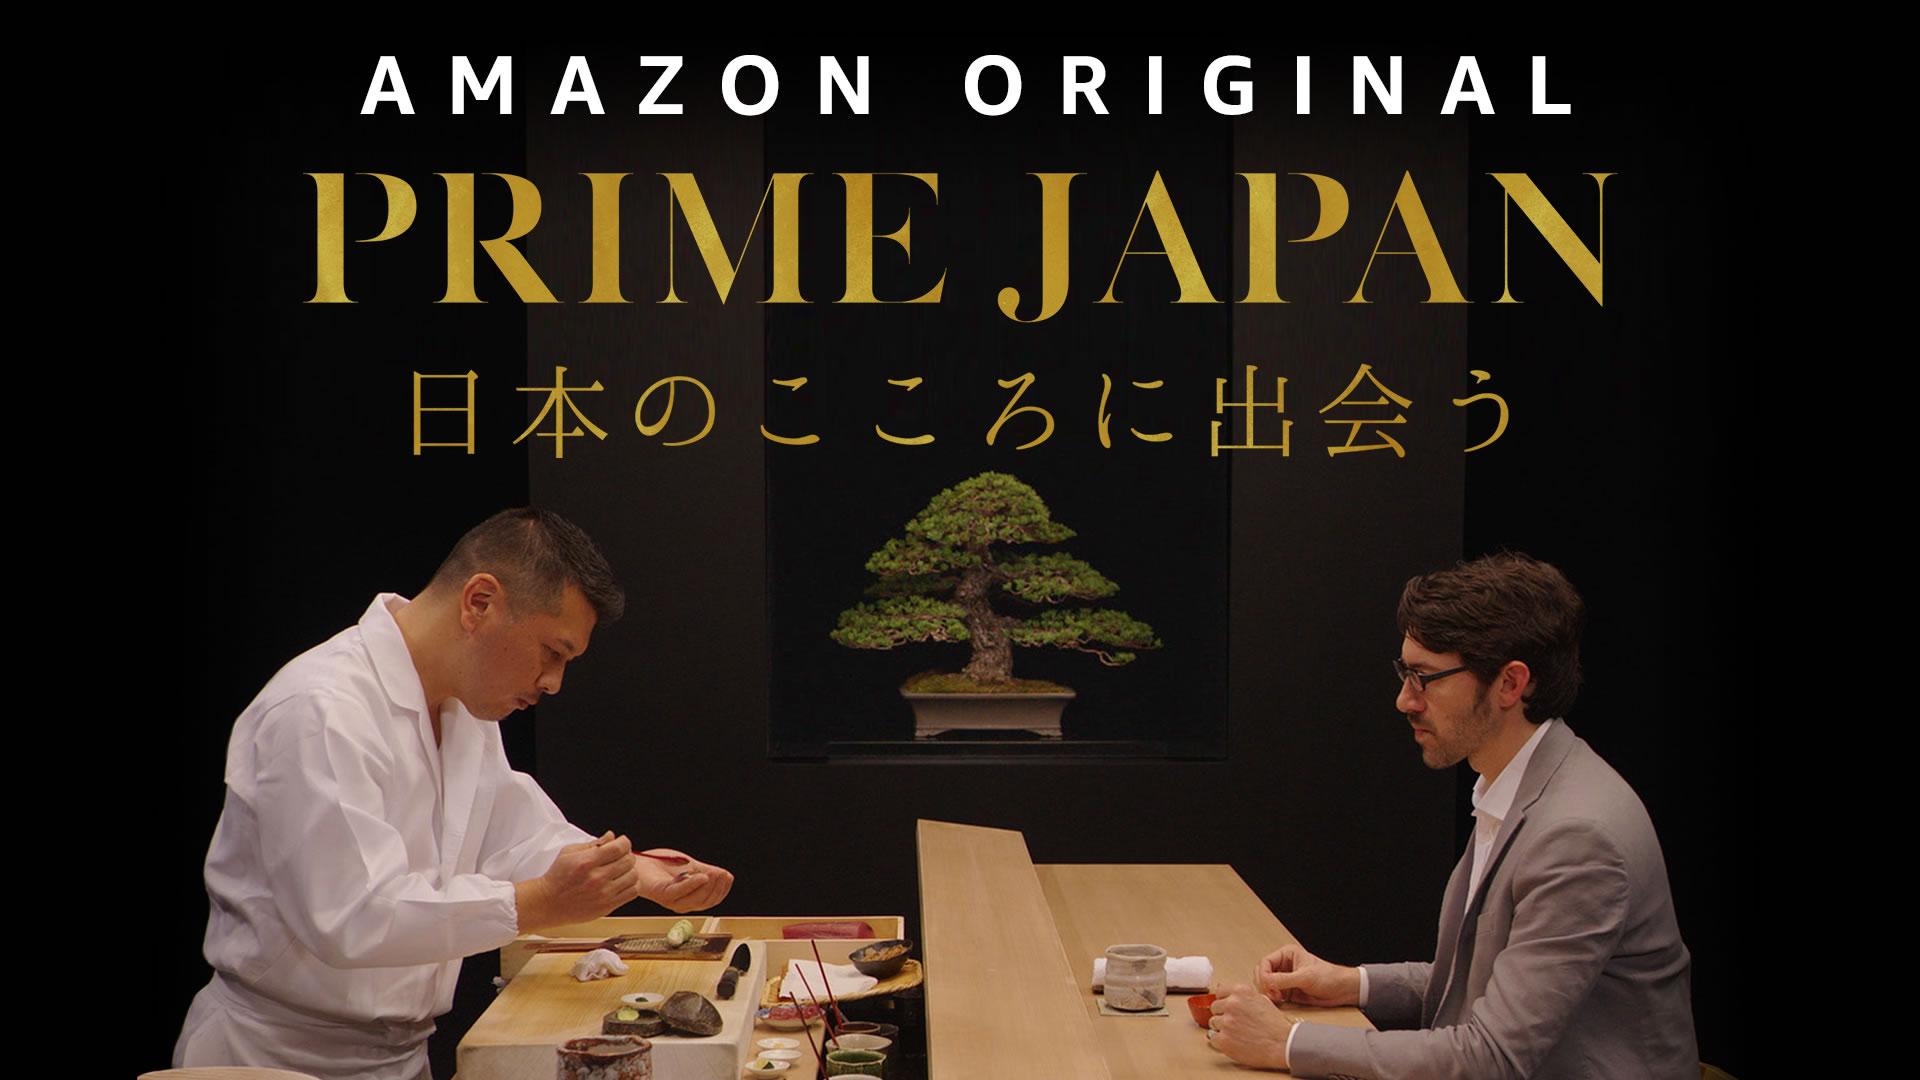 PRIME JAPAN  日本のこころに出会う (4K UHD)